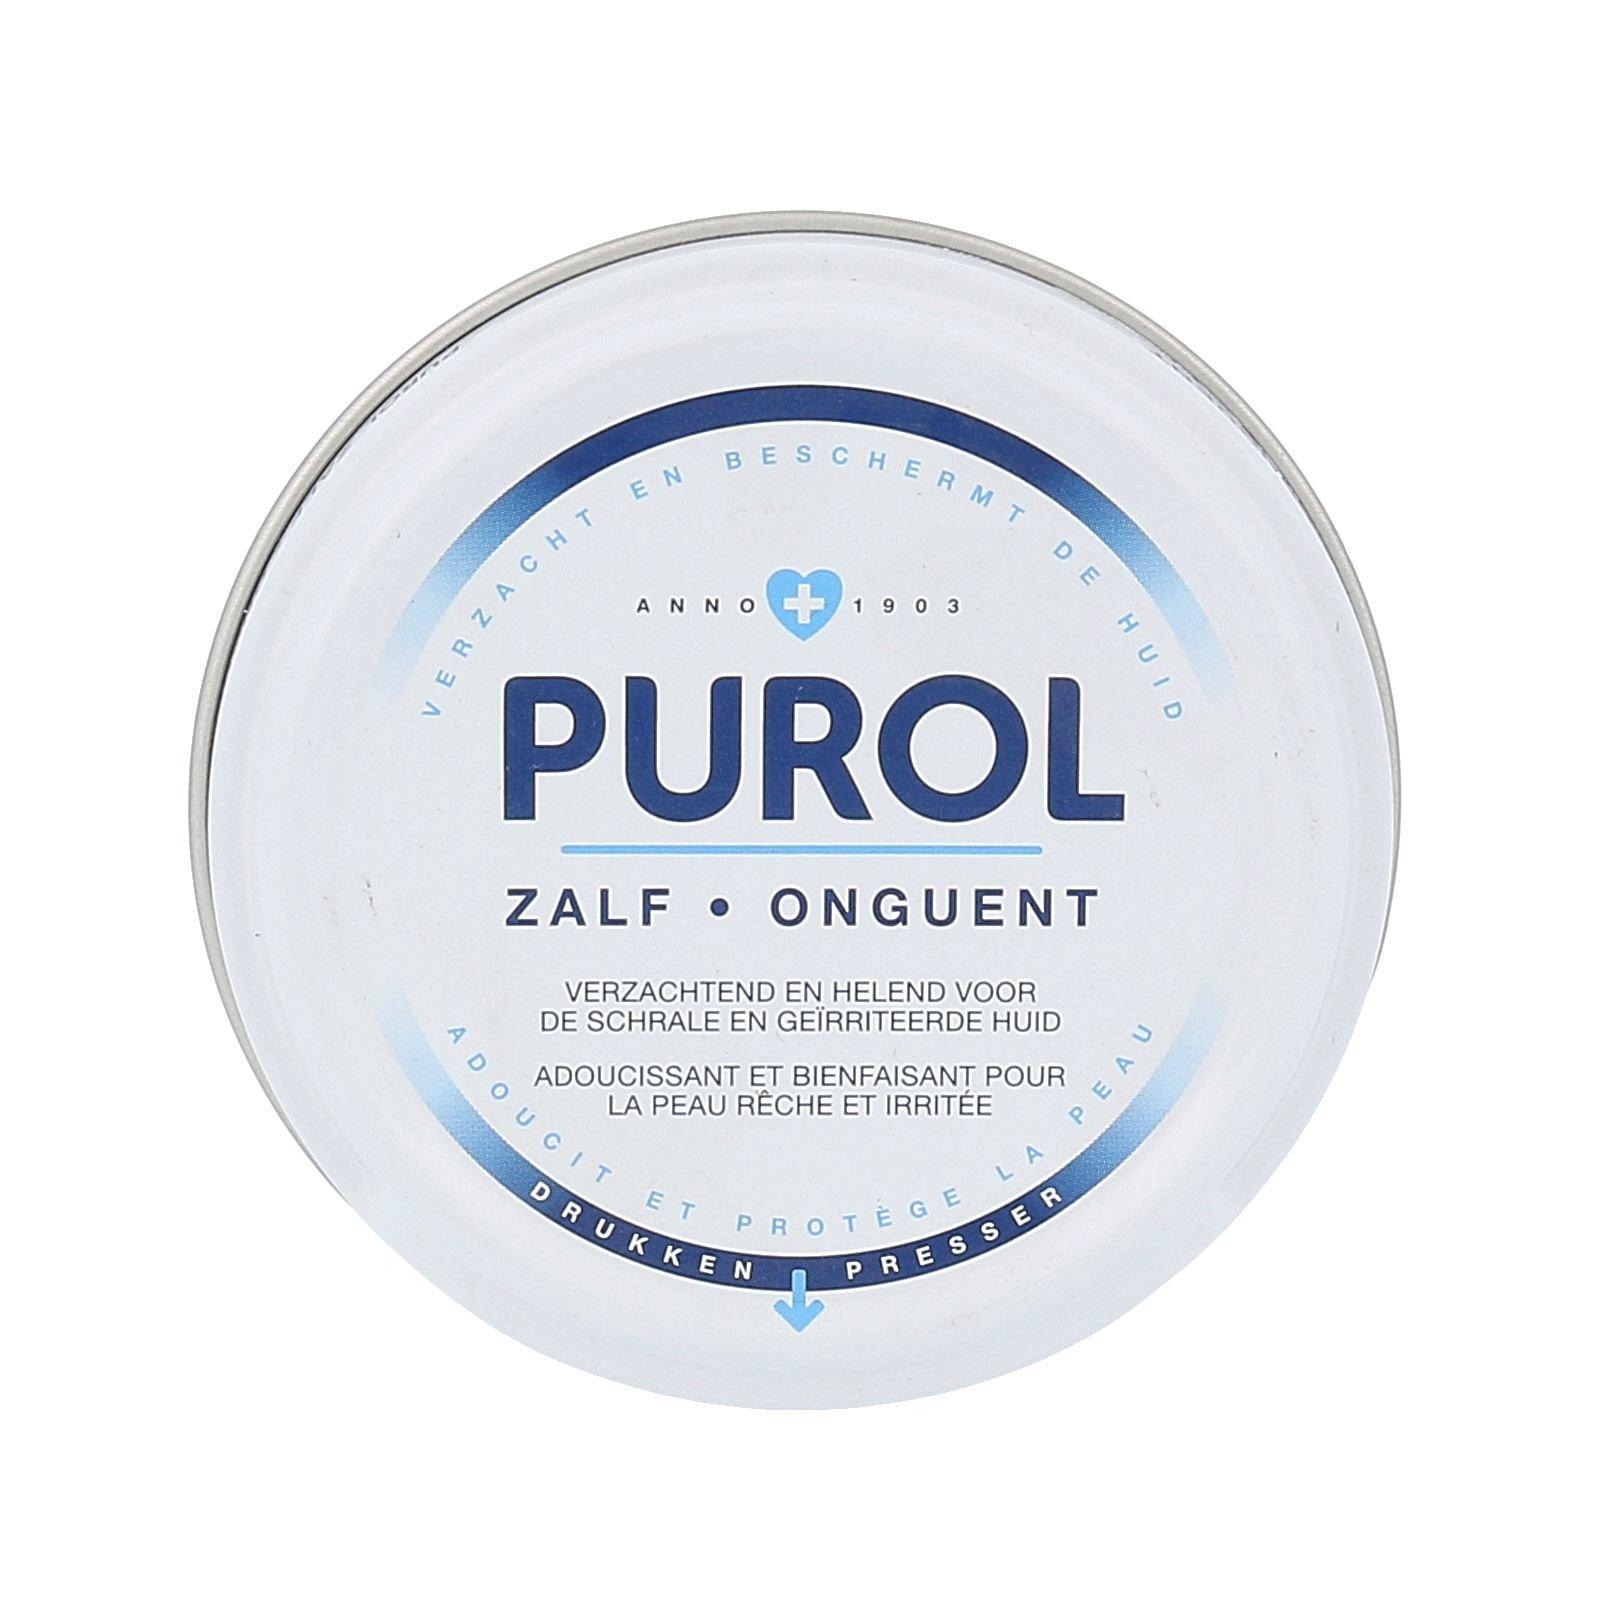 Purol Salve Unguent Balm Cosmetic 50ml